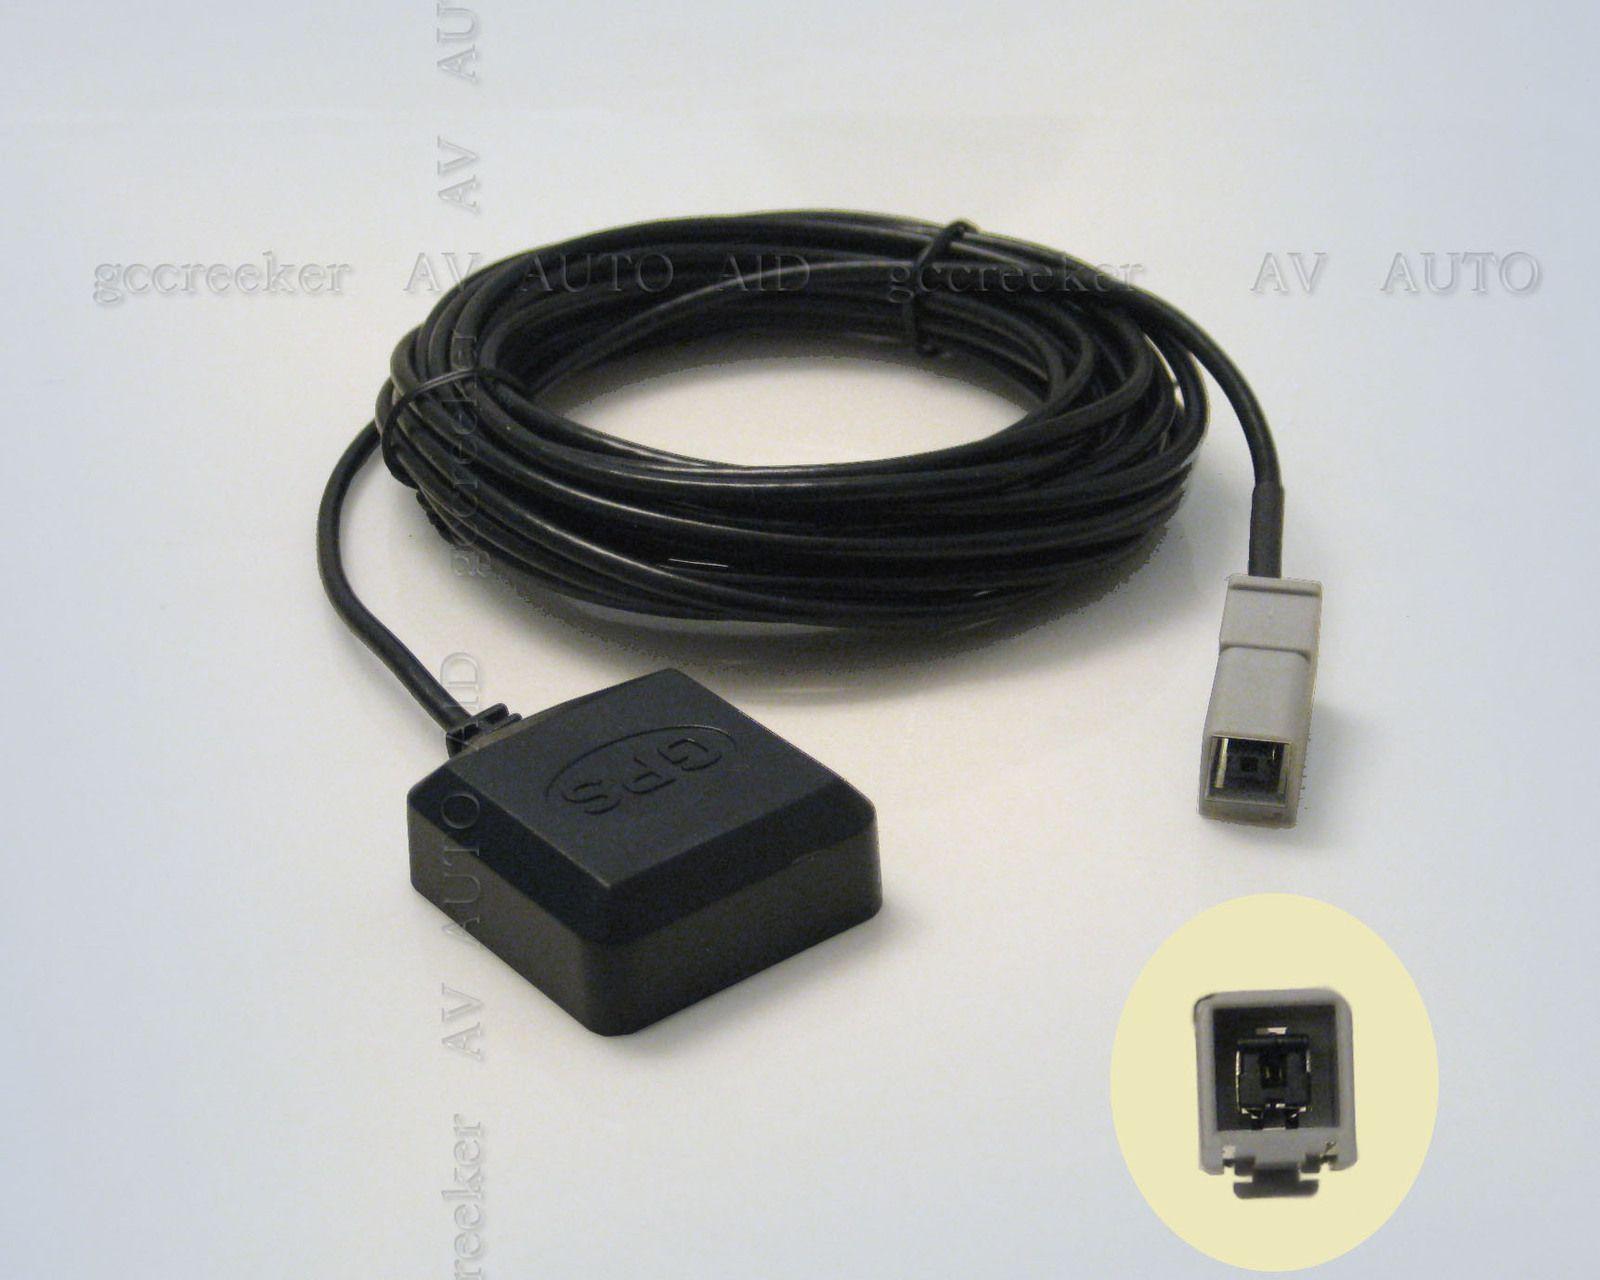 GPS Antenna for Chrysler Dodge Jeep RB1 Navigation Radio Headunit